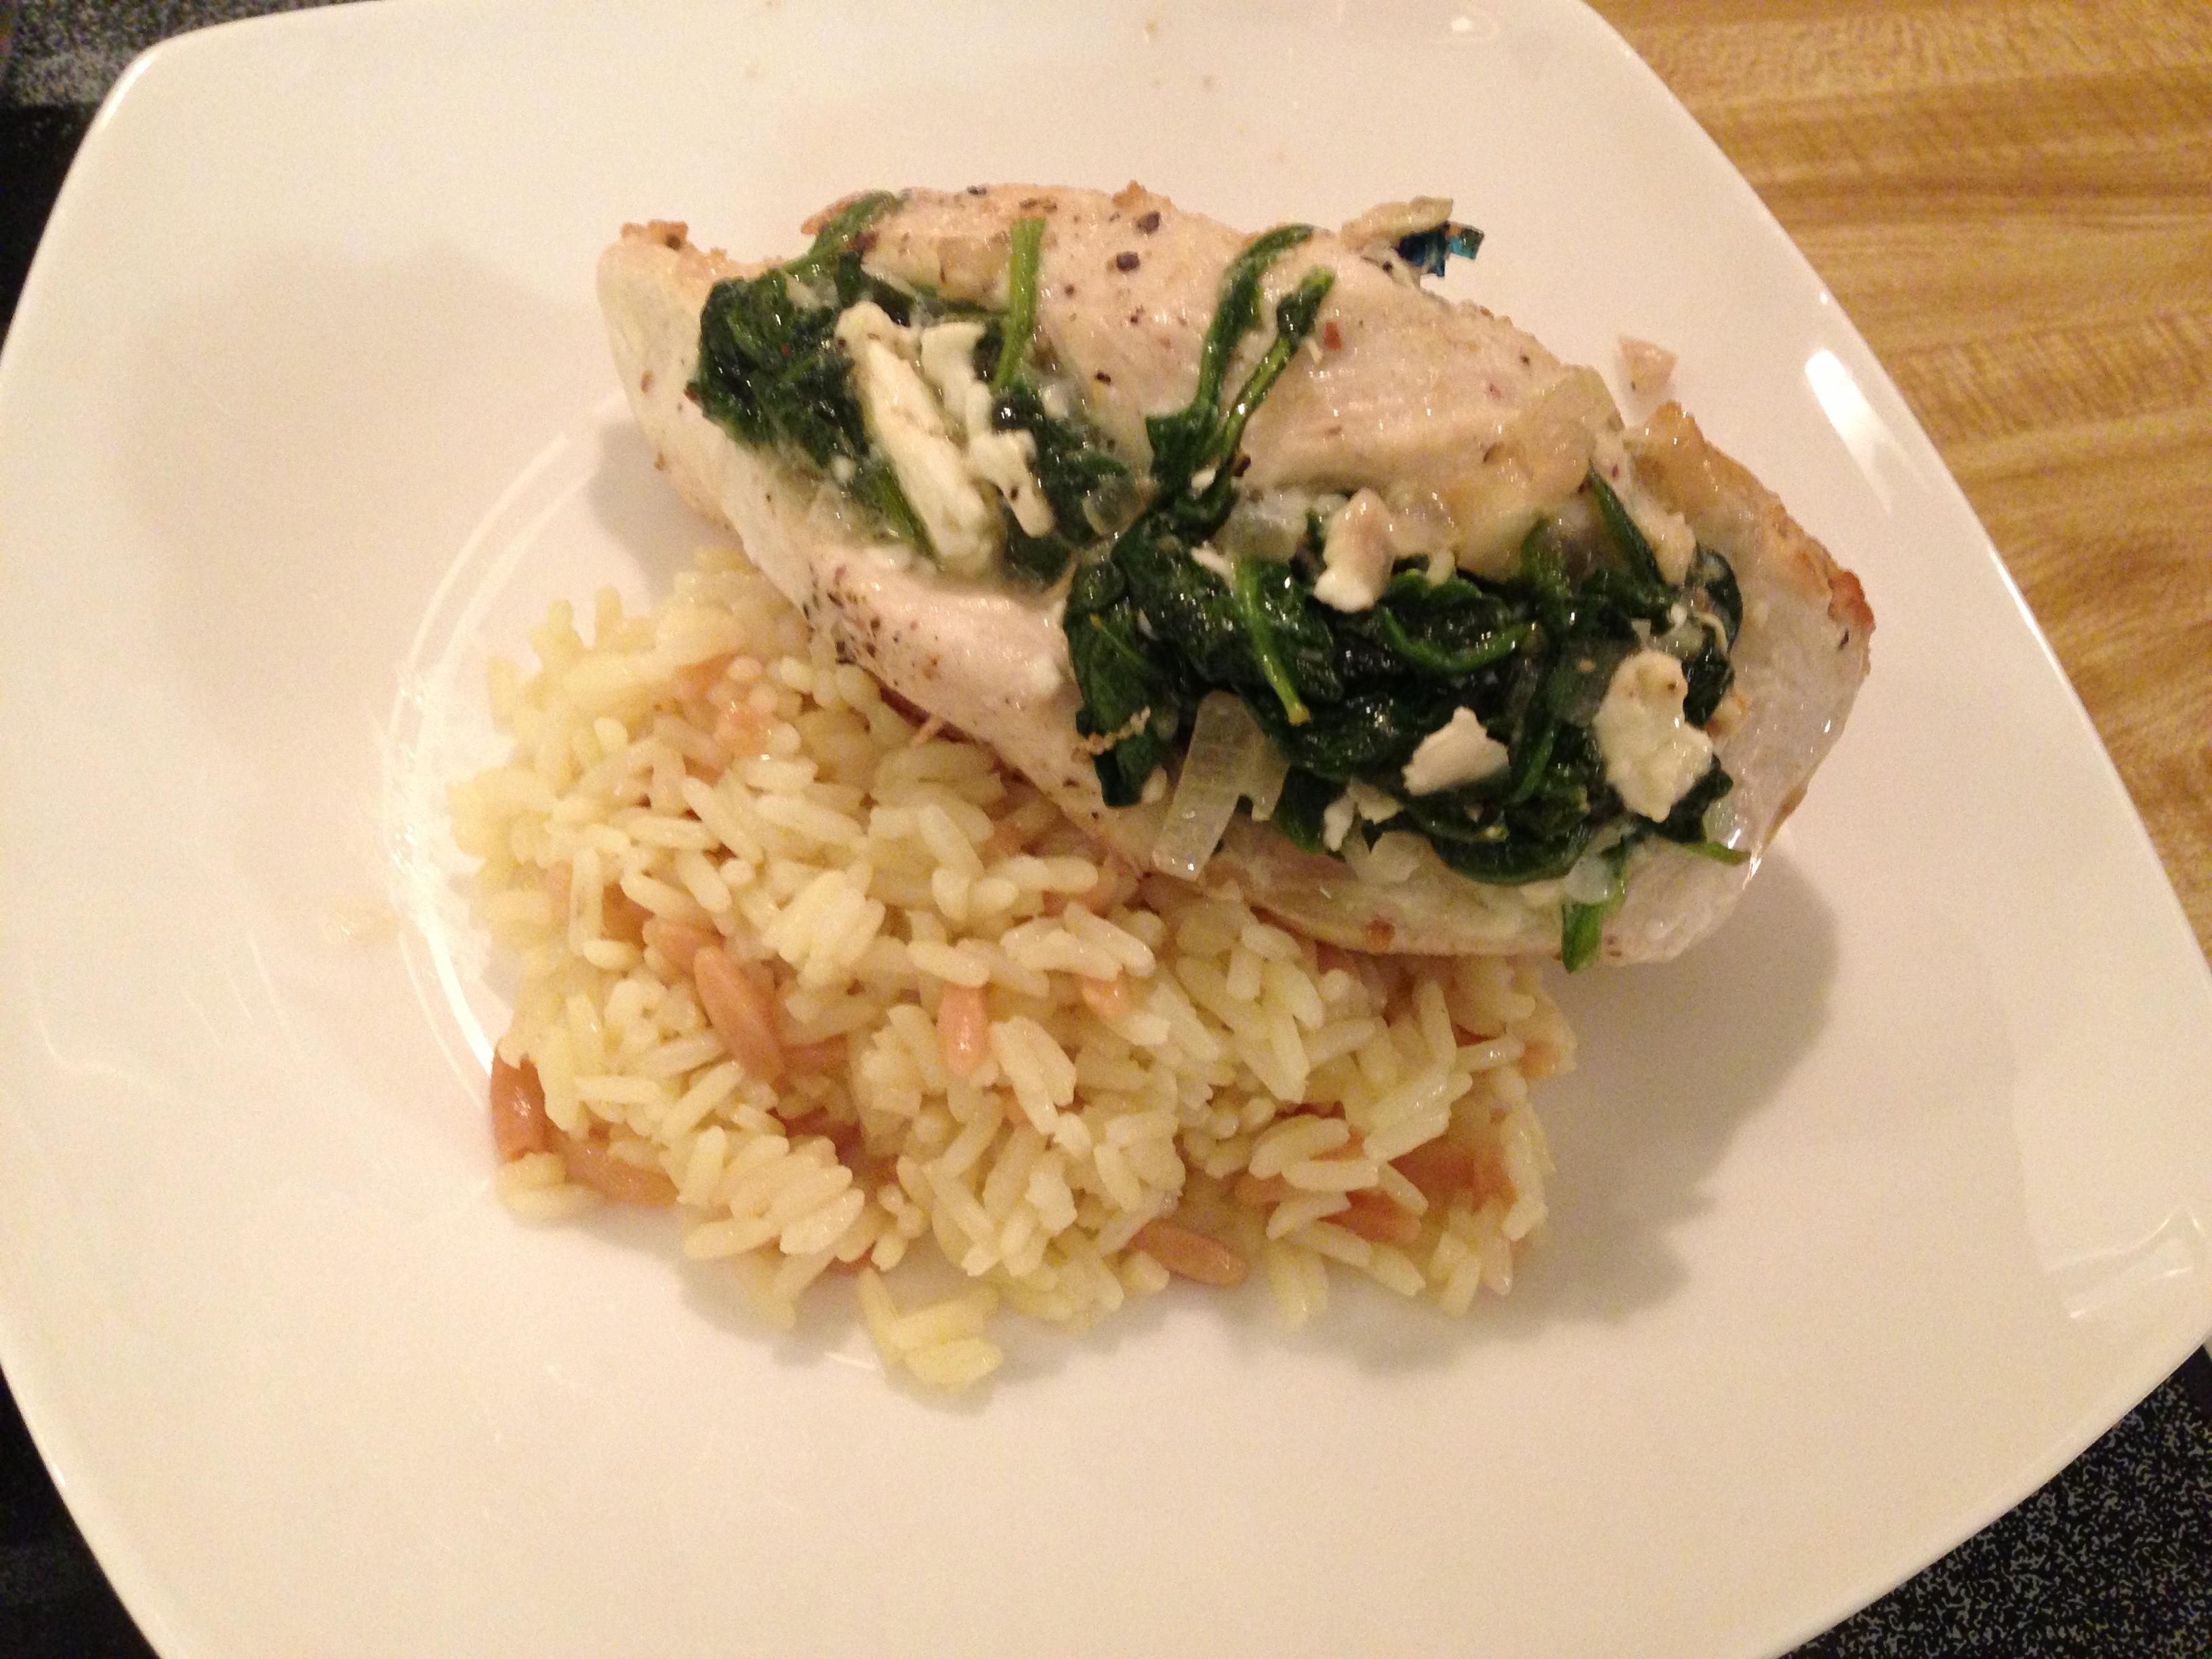 Spinach and Feta Stuffed Chicken – Jewtalian's Recipes